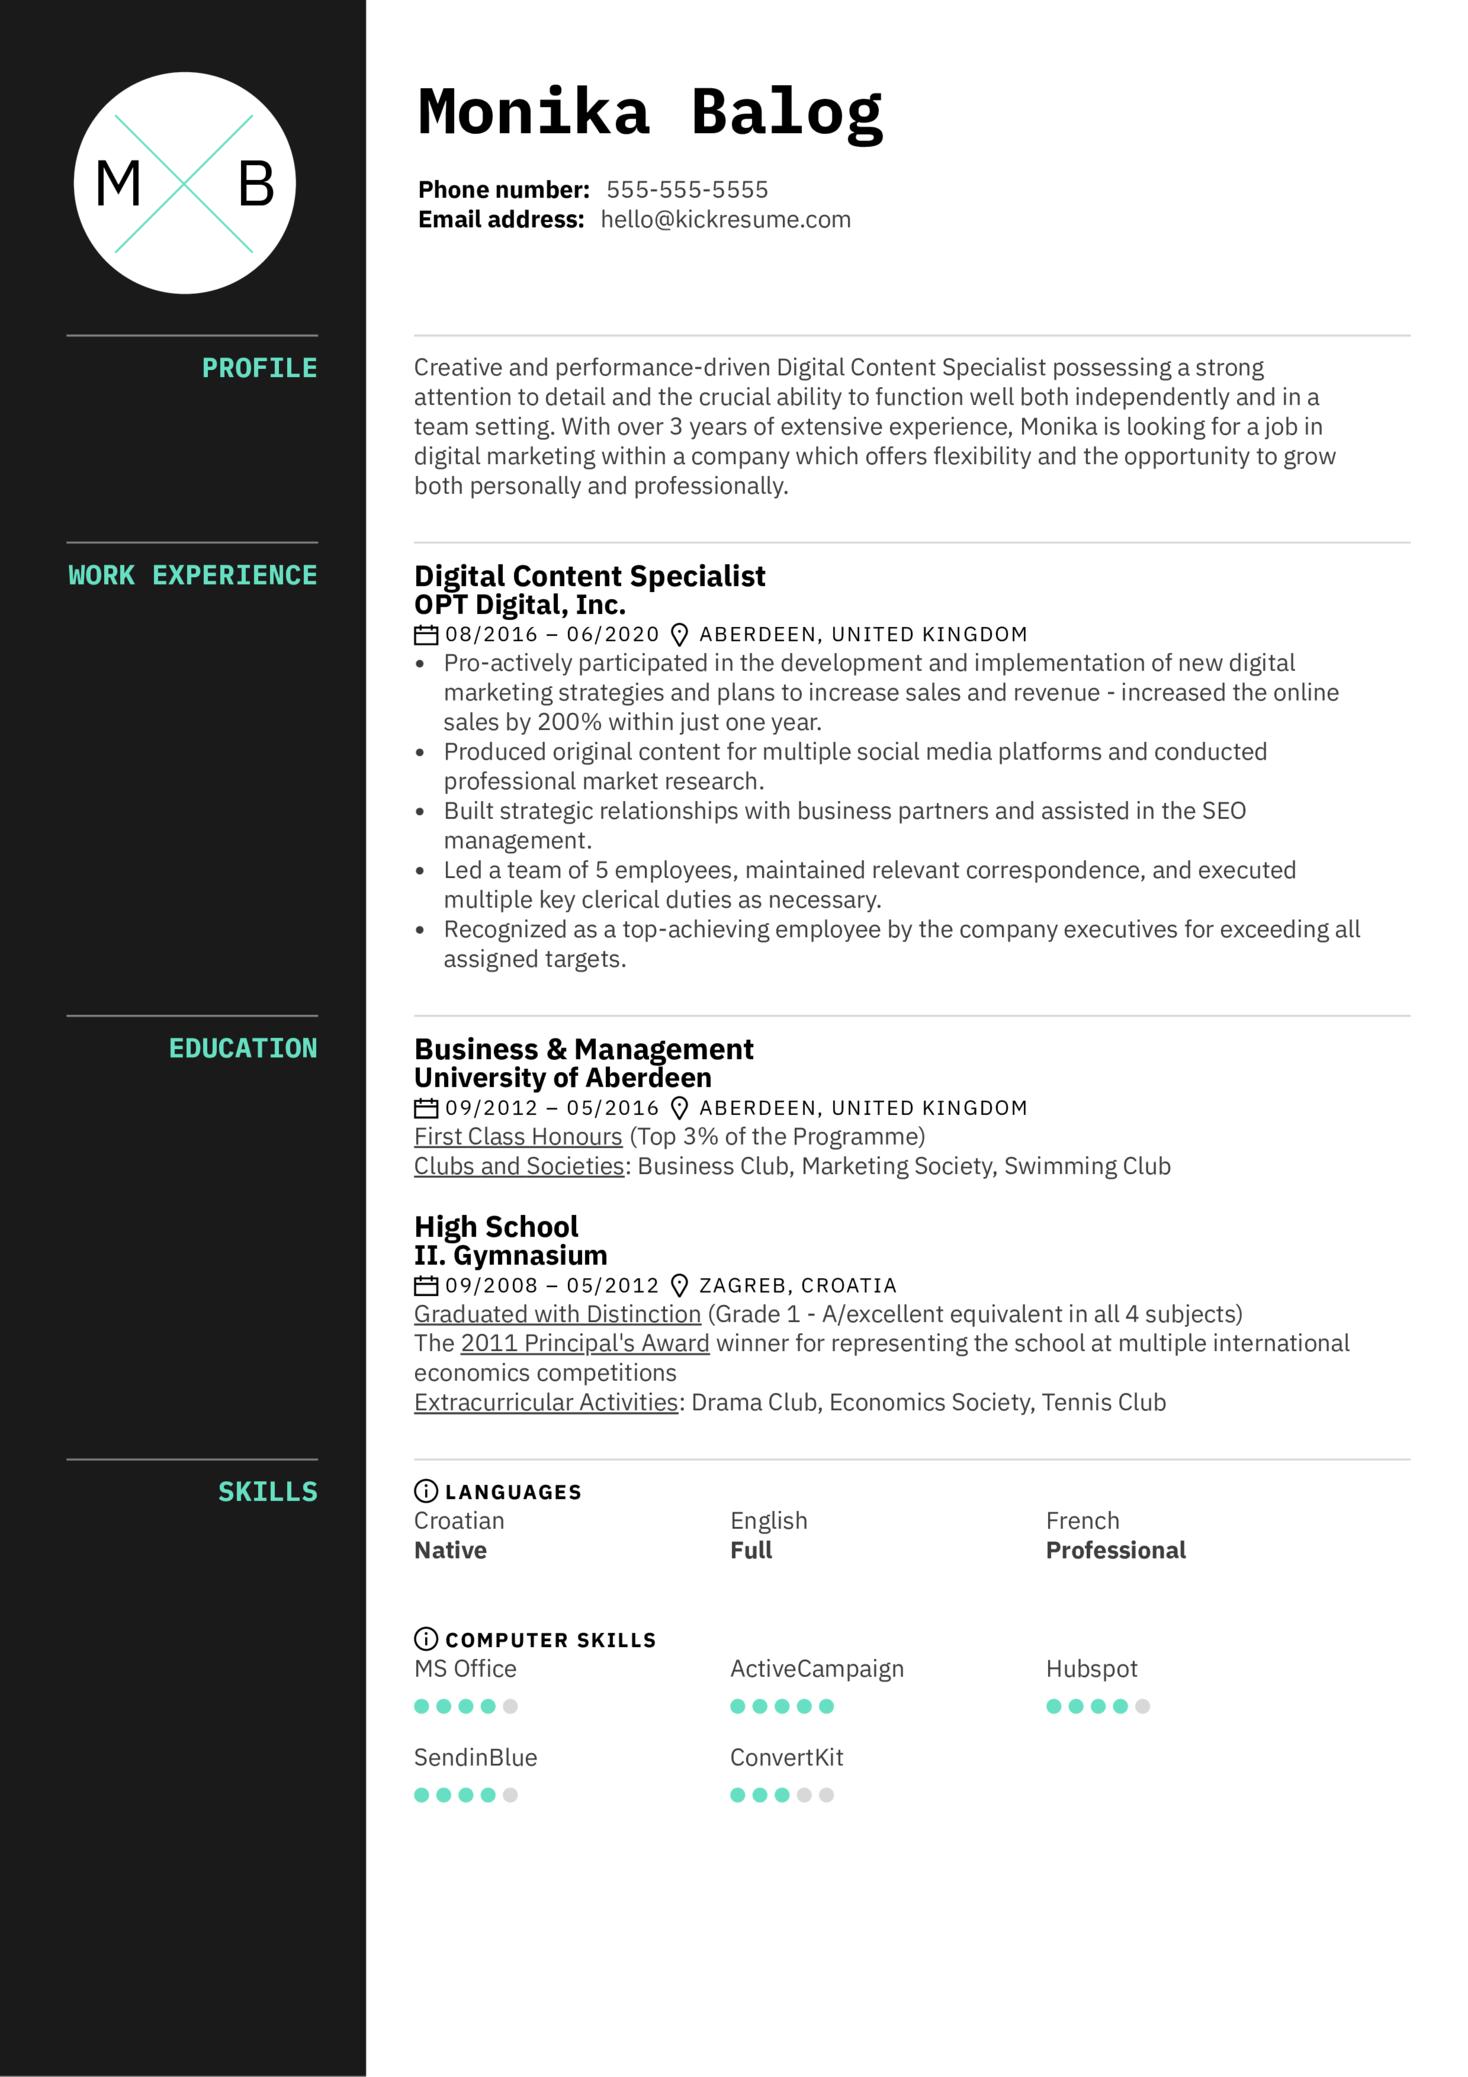 Digital Content Specialist Resume Example (parte 1)